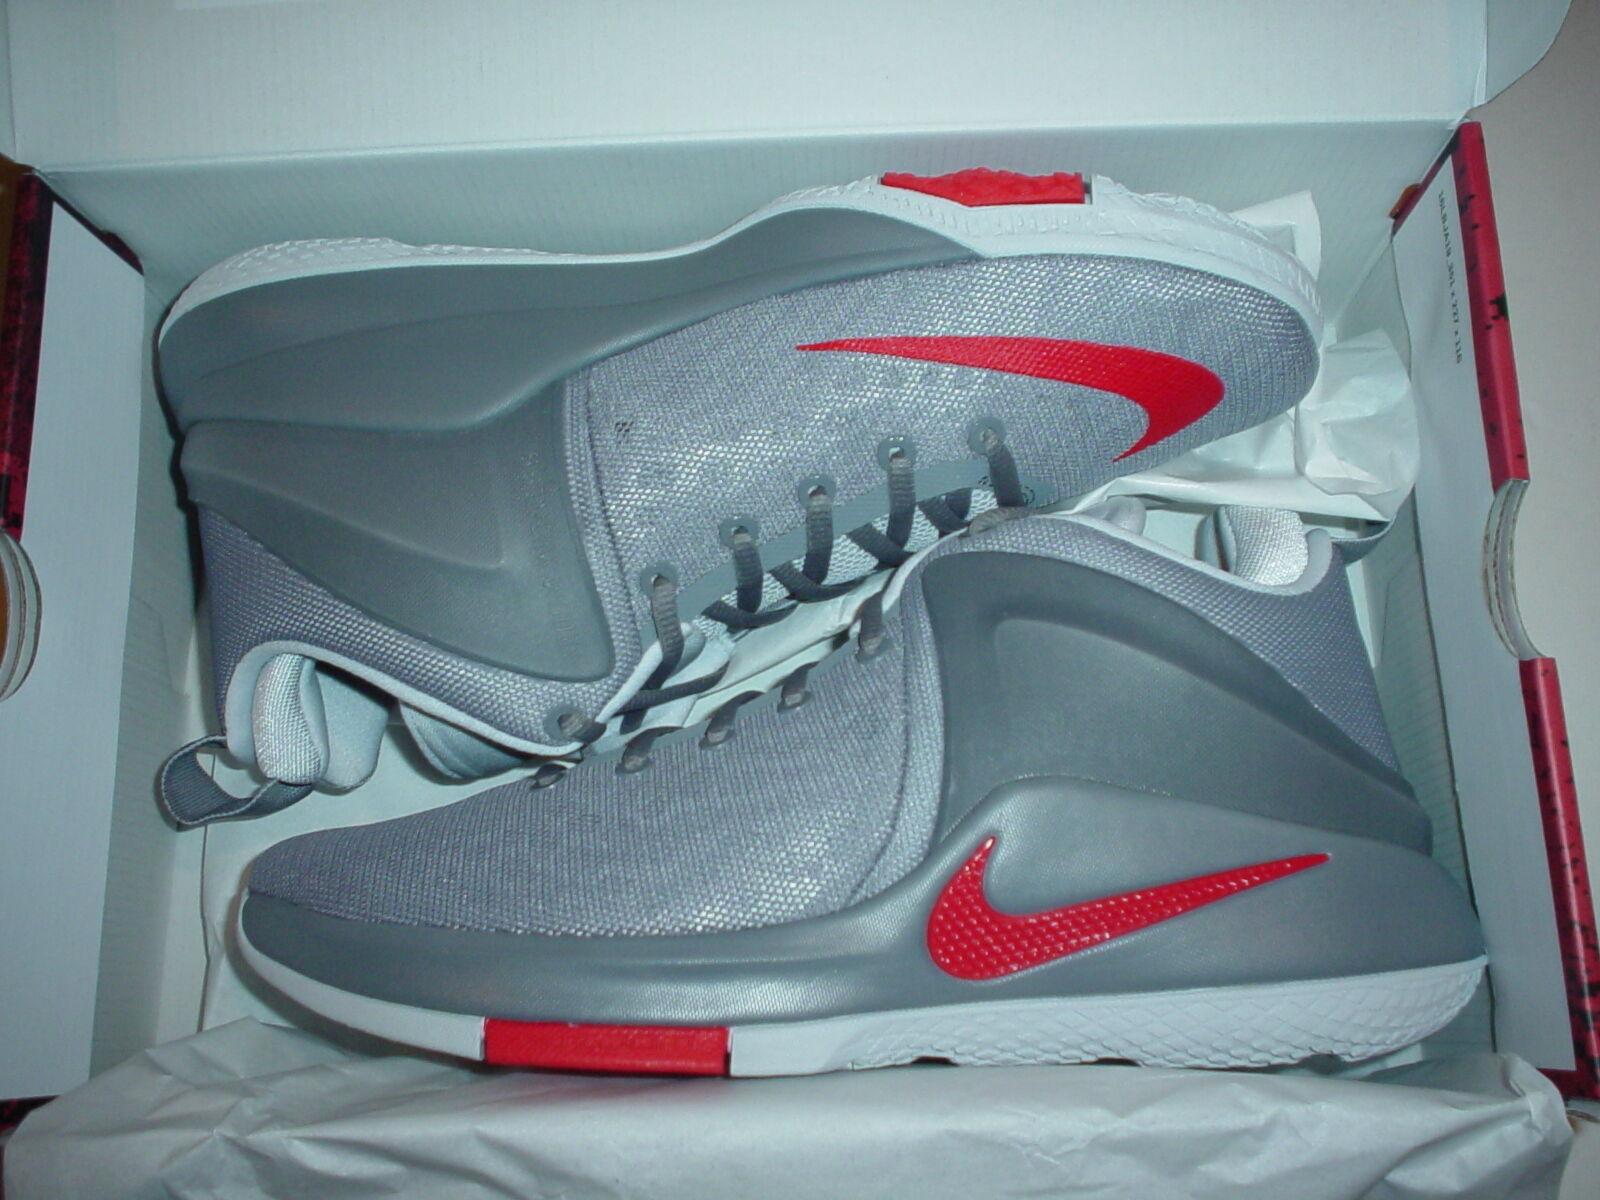 Nike Zoom Witness COOL GREY/RED Lebron James Basketball 10.5 Shoes  NIB